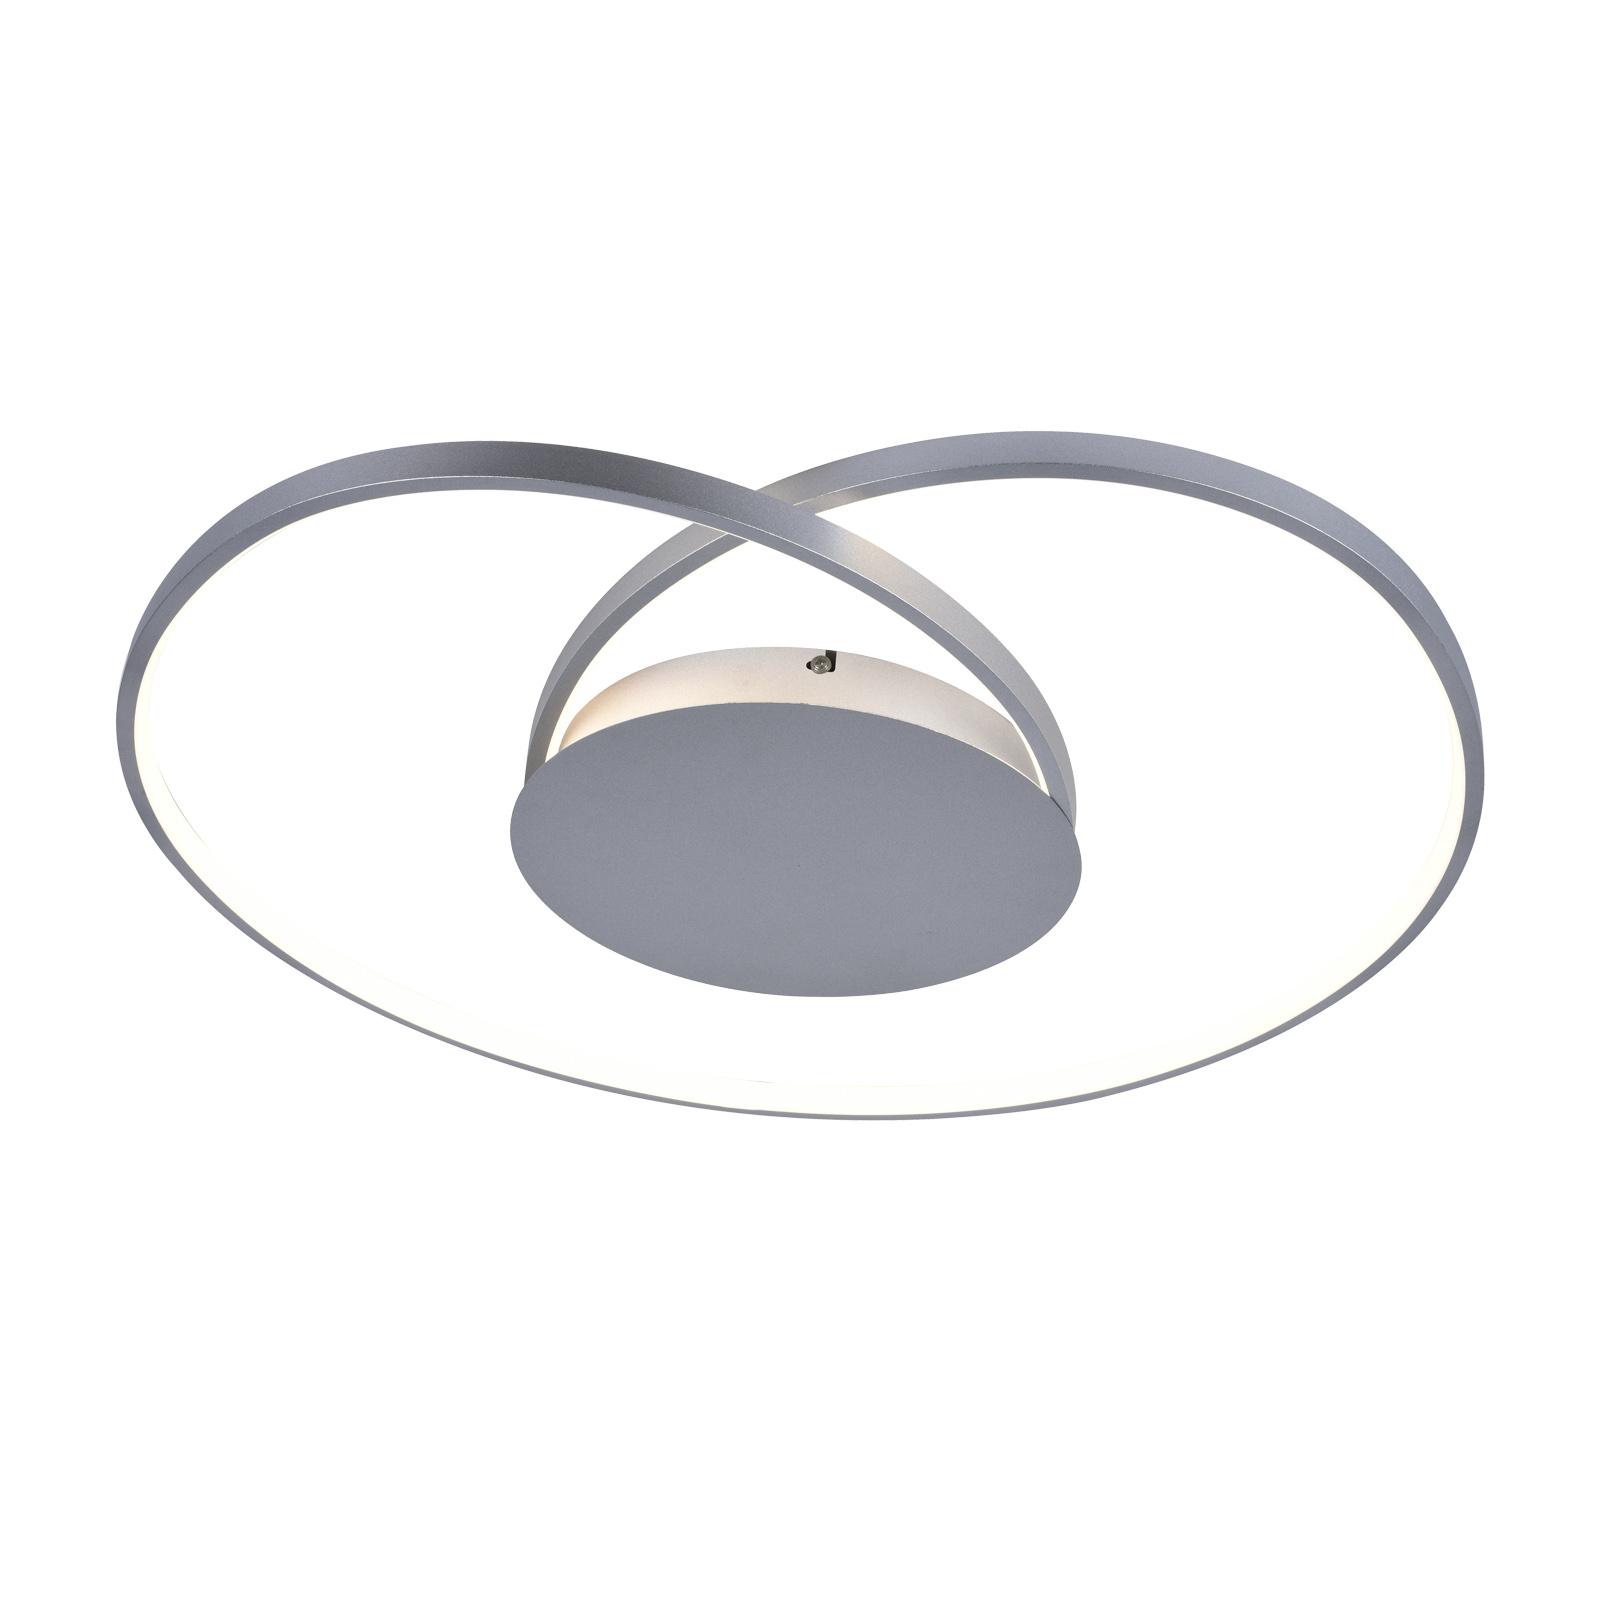 Lucande Enesa lampa sufitowa LED, okrągła, CCT